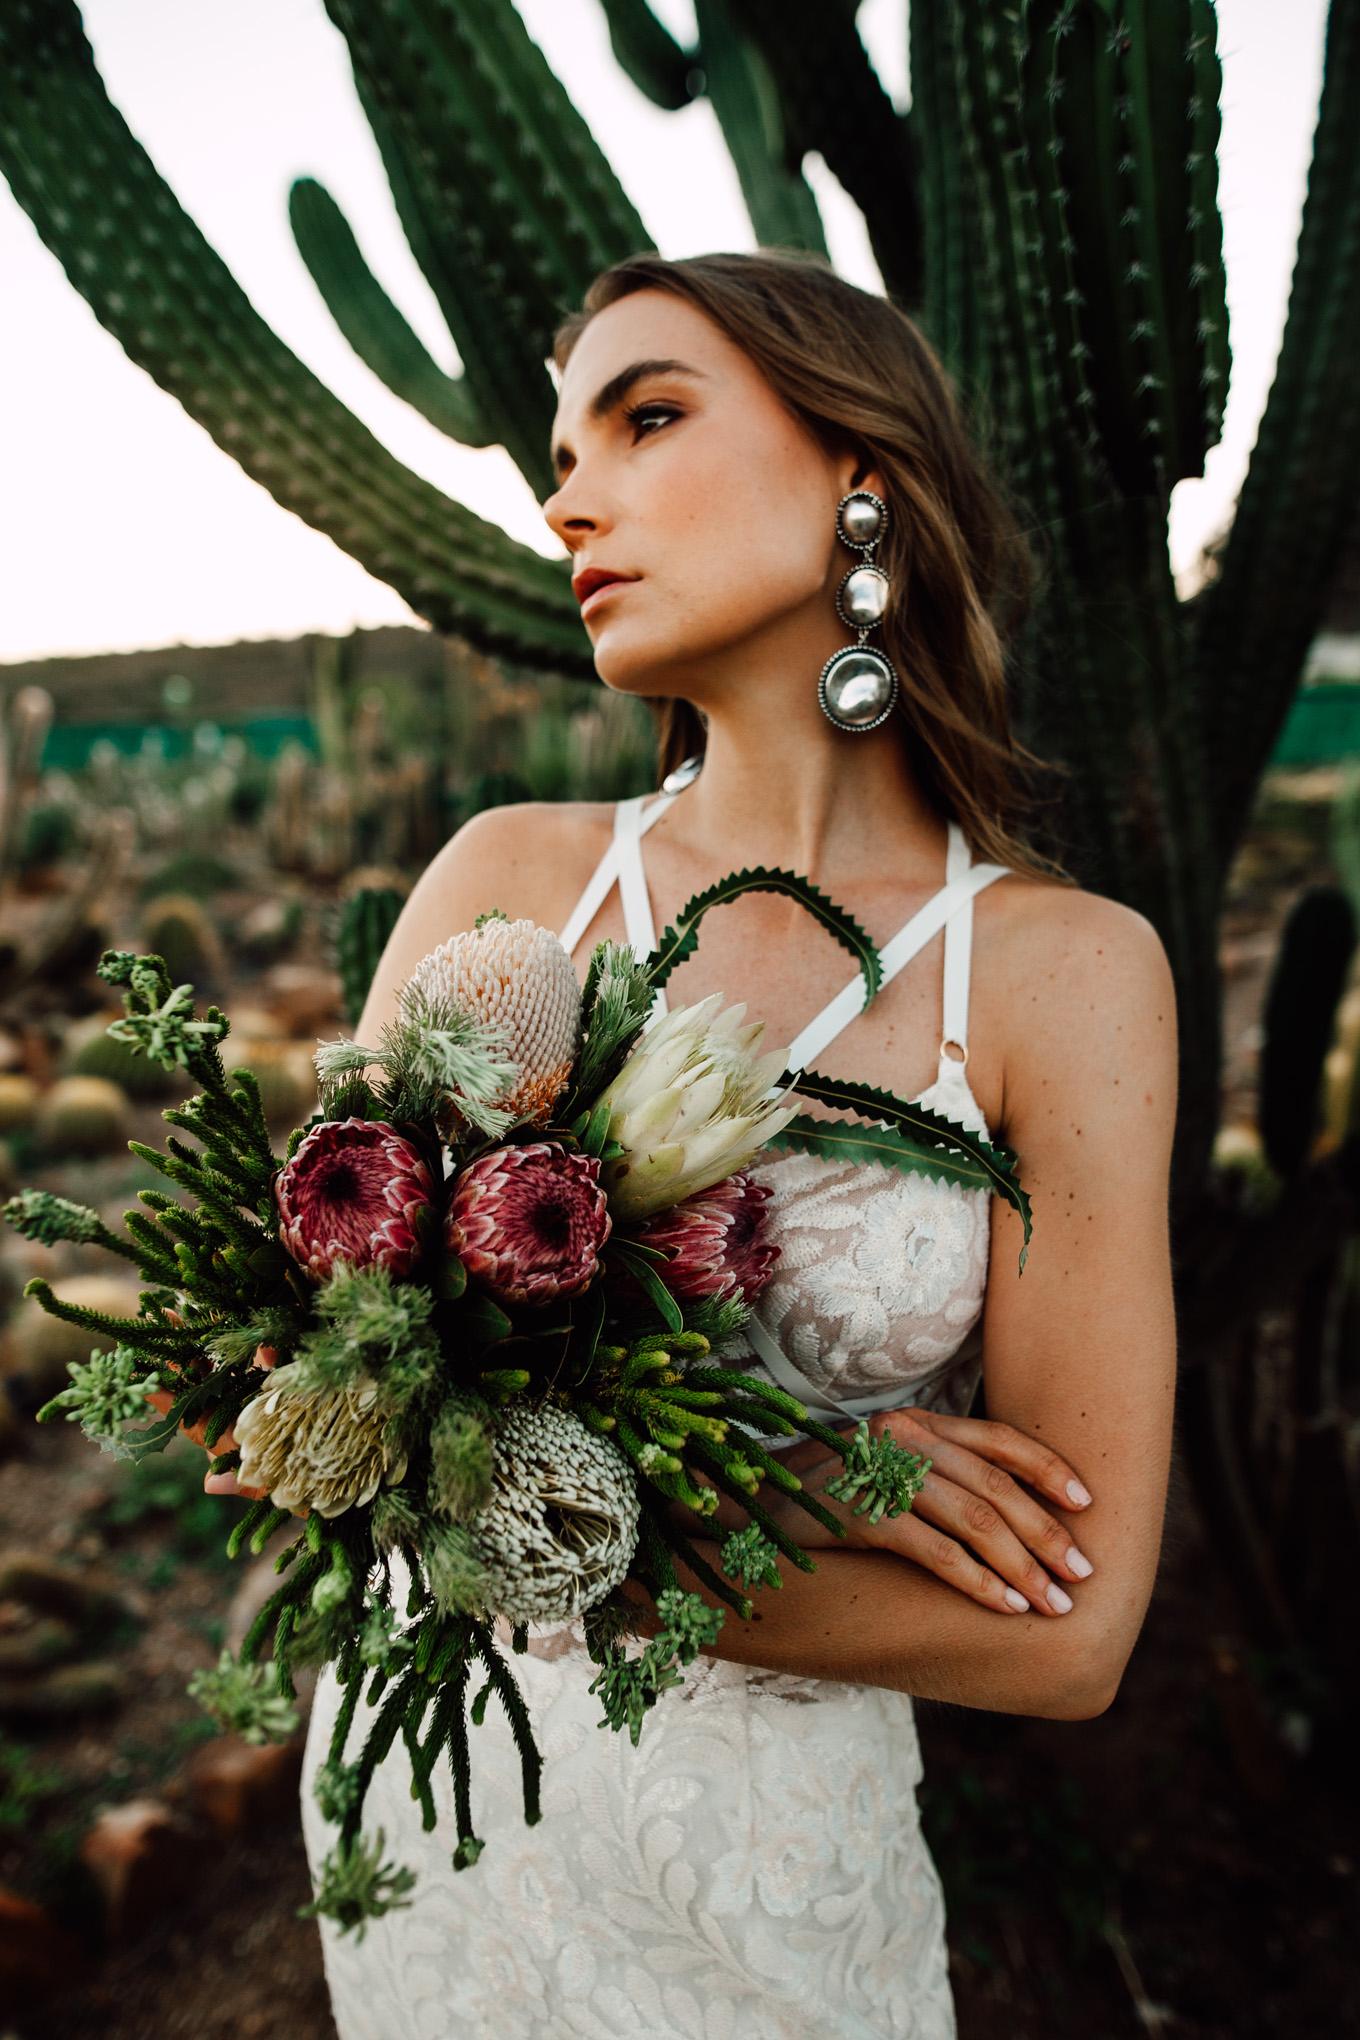 Cape-Town-Pia-Anna-Christian-Wedding-Photography-South-Africa-Bride-Cactus-11.jpg